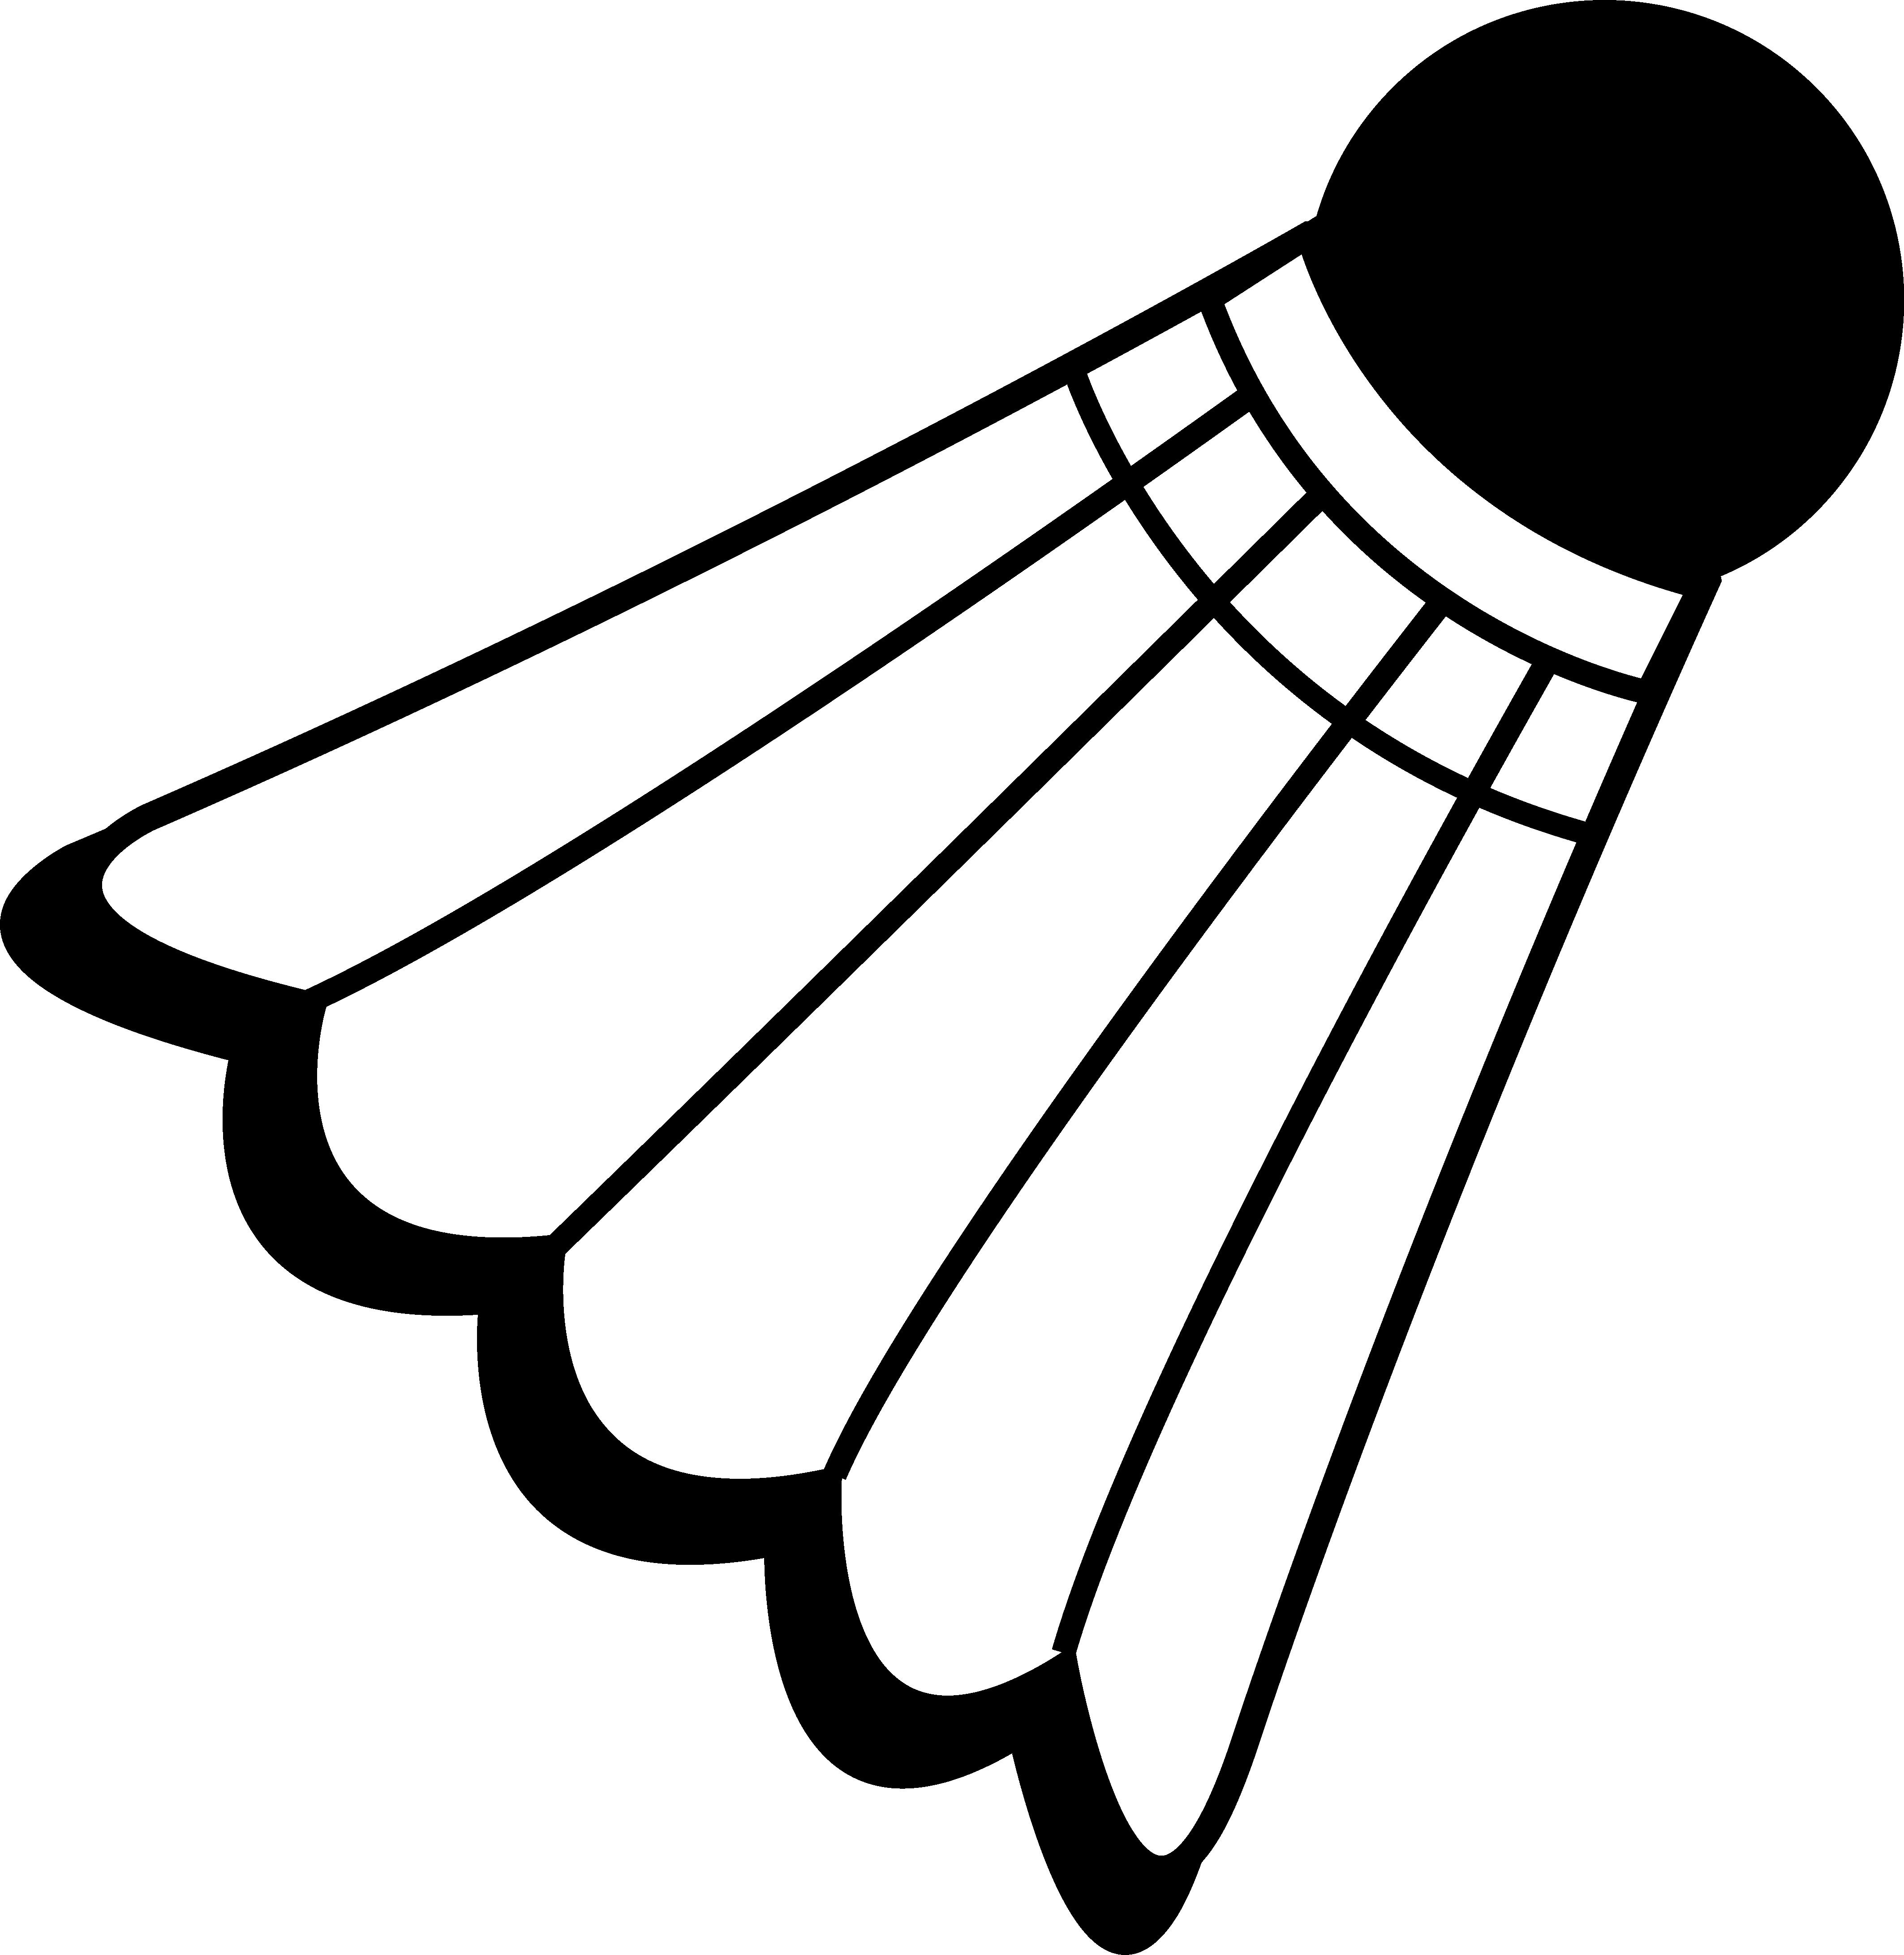 Download free png transparent. Badminton clipart shuttlecock